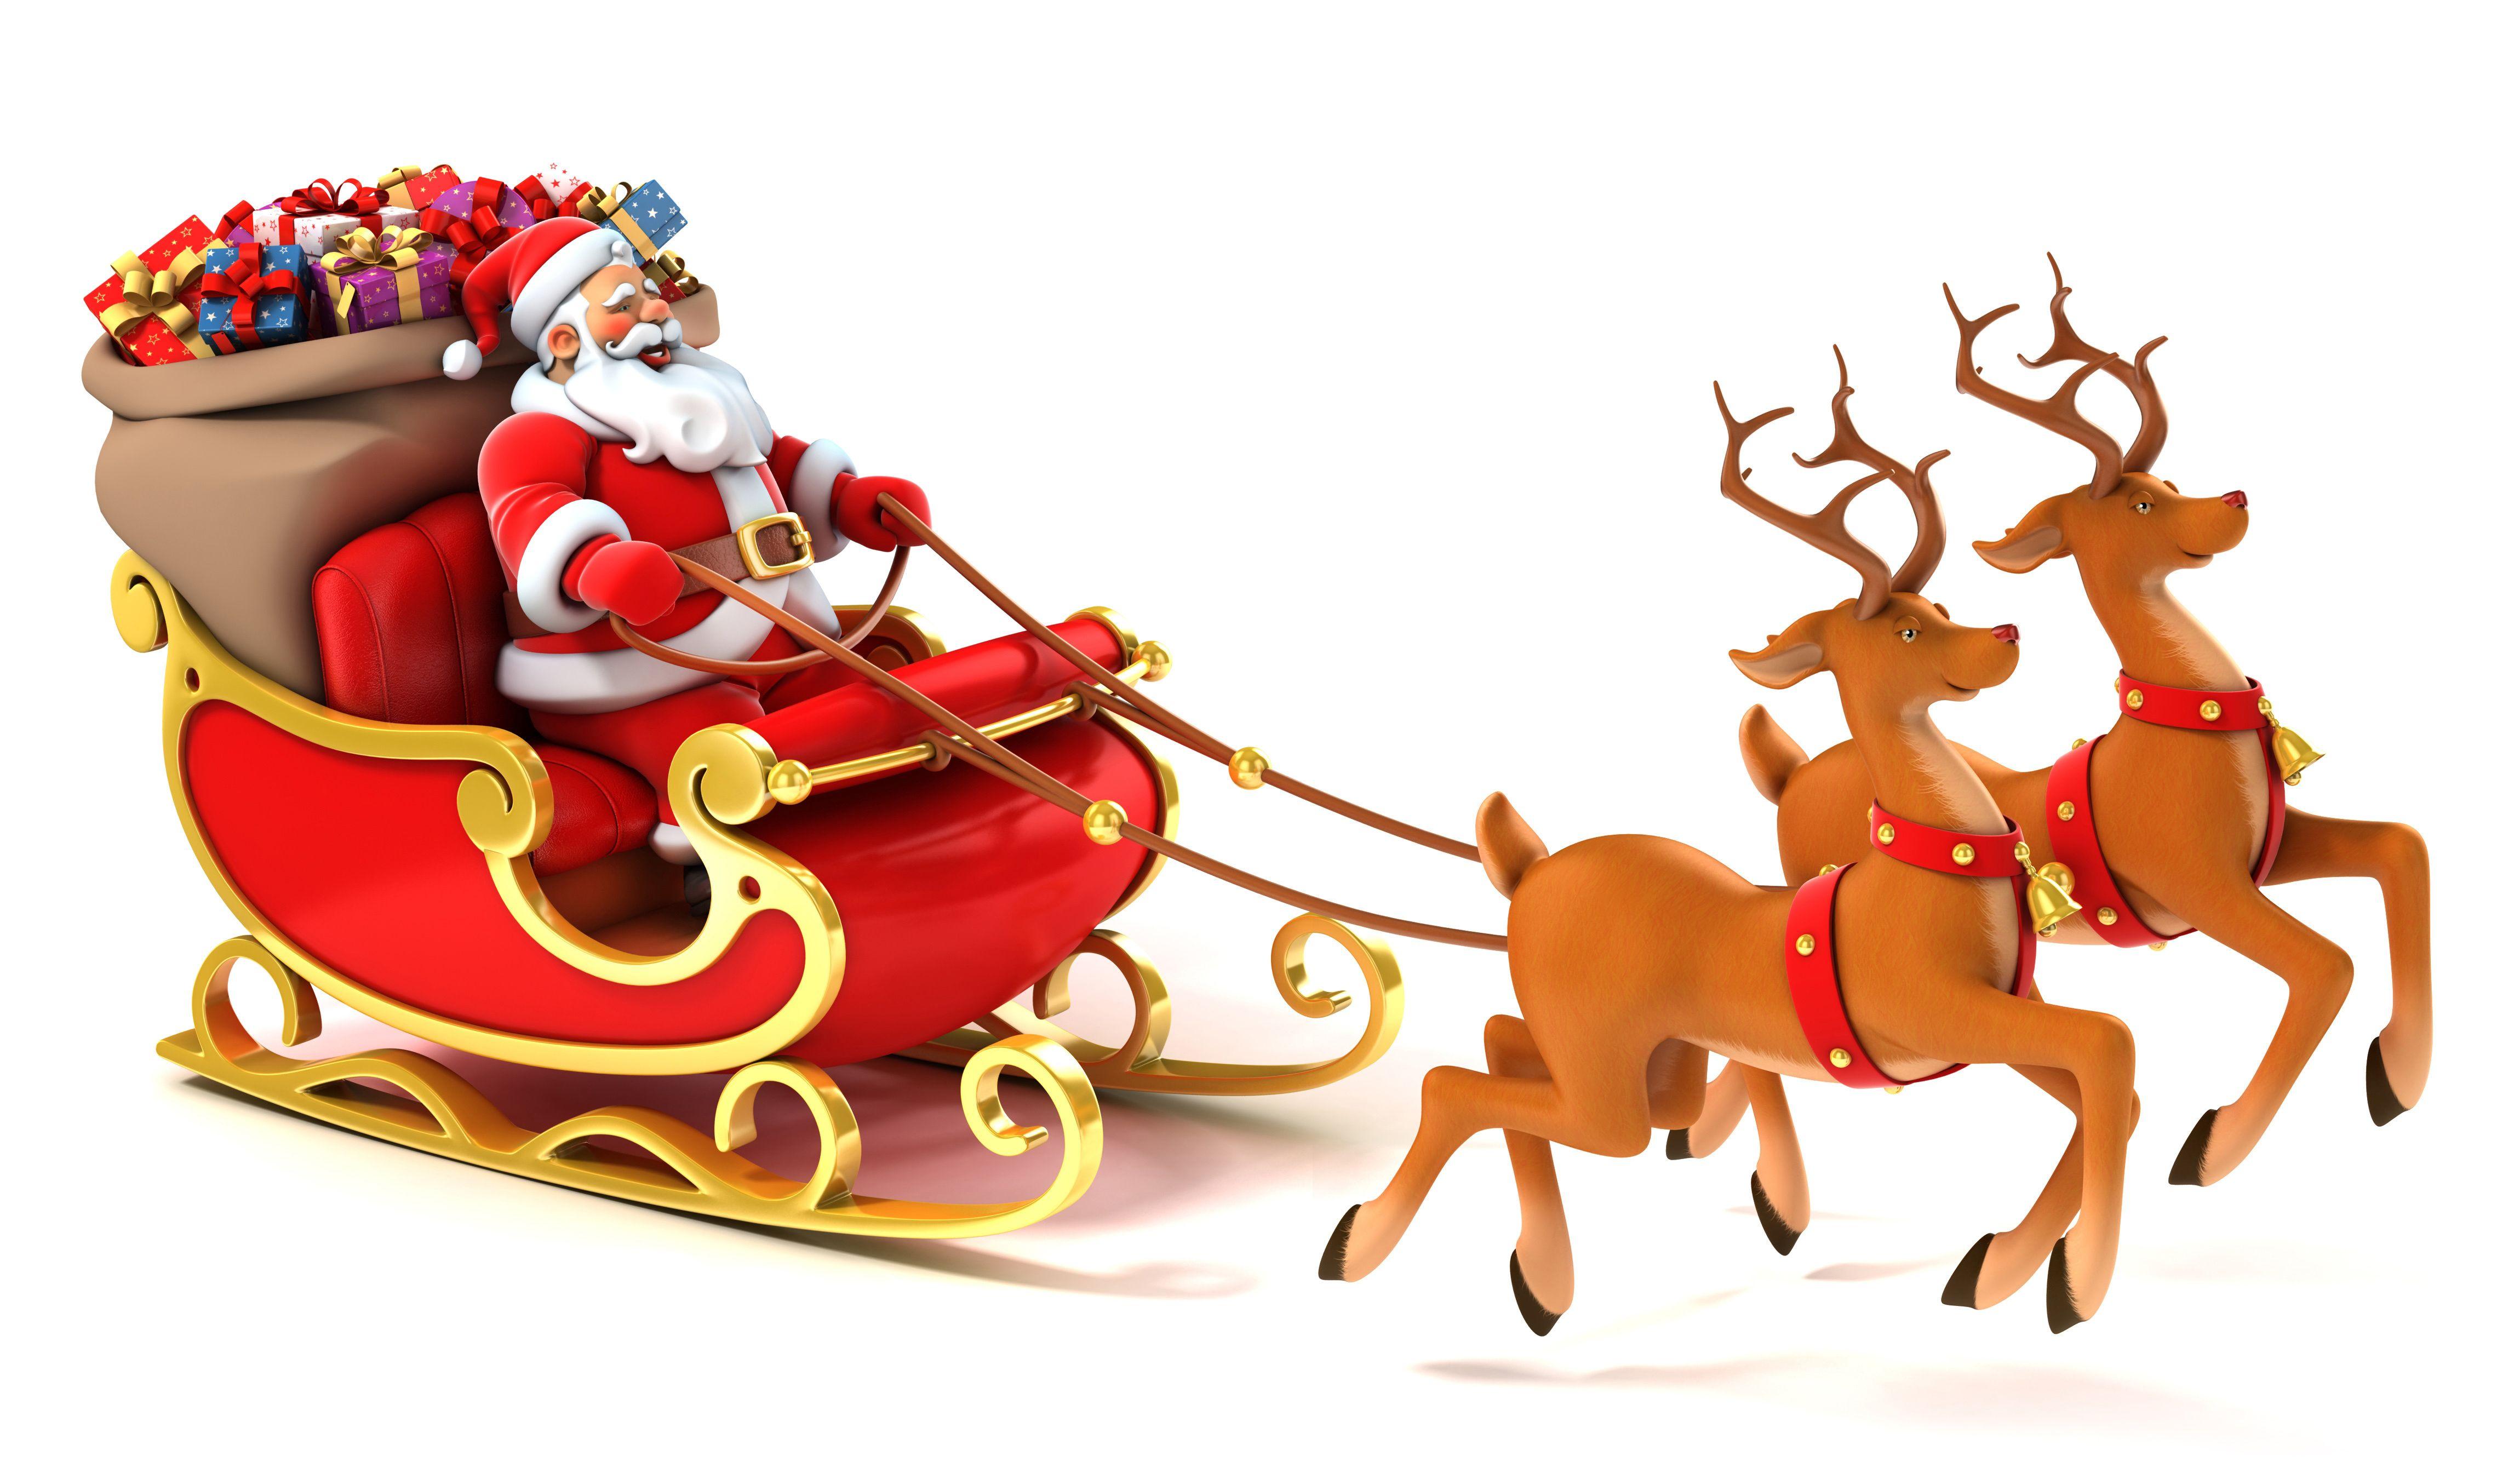 Pin By Diana Watson On Christmas: Pin By Diana Watson On Christmas